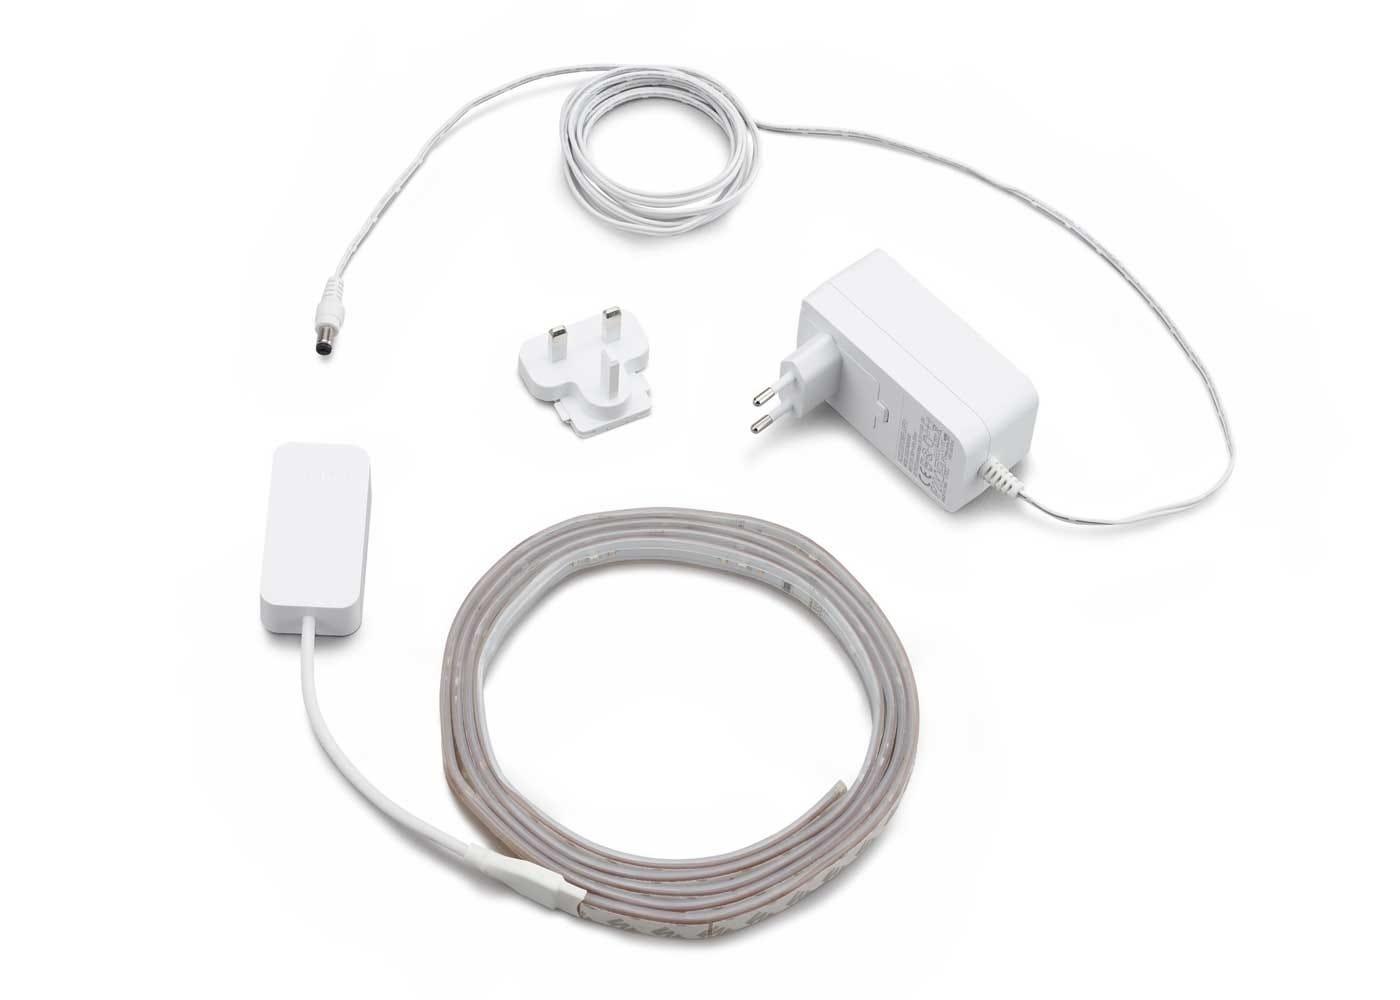 As shpwn in image: Hue 2m LightStrips, Power Adaptor UK, 1x Universal Adaptor